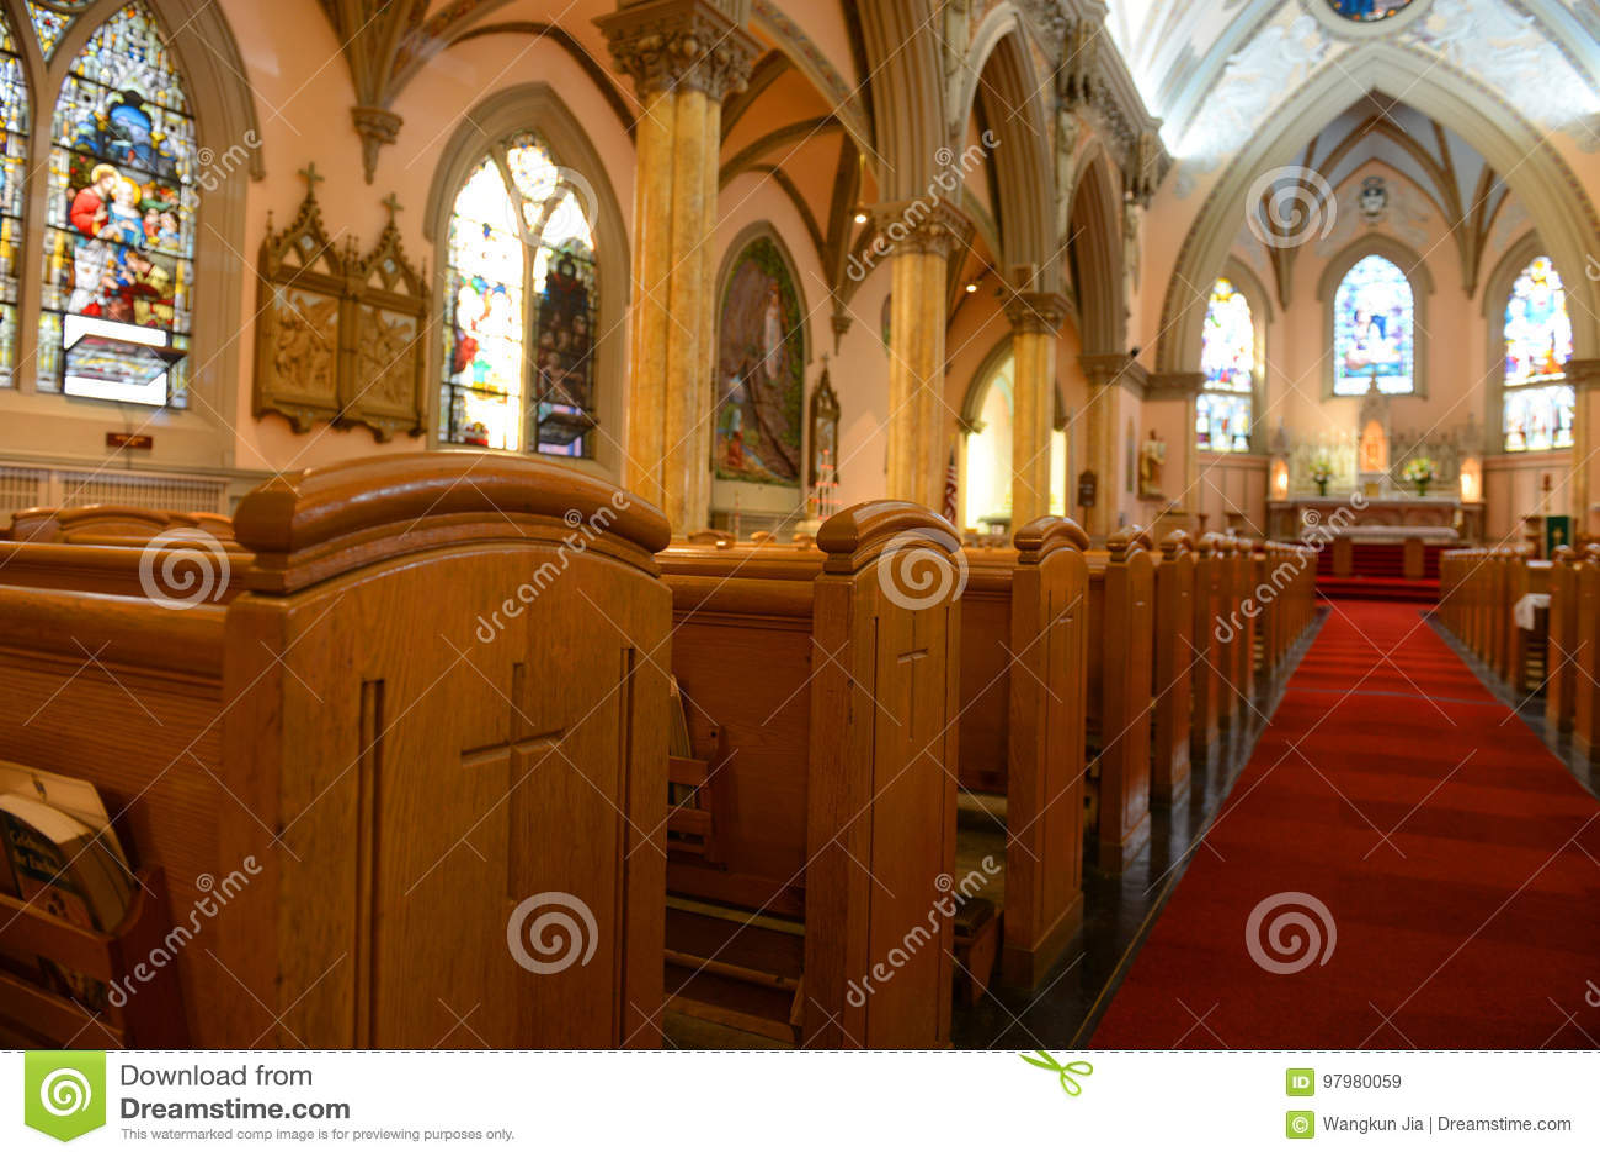 Nuestra señora de las victorias iglesia, Boston, los E.E.U.U.